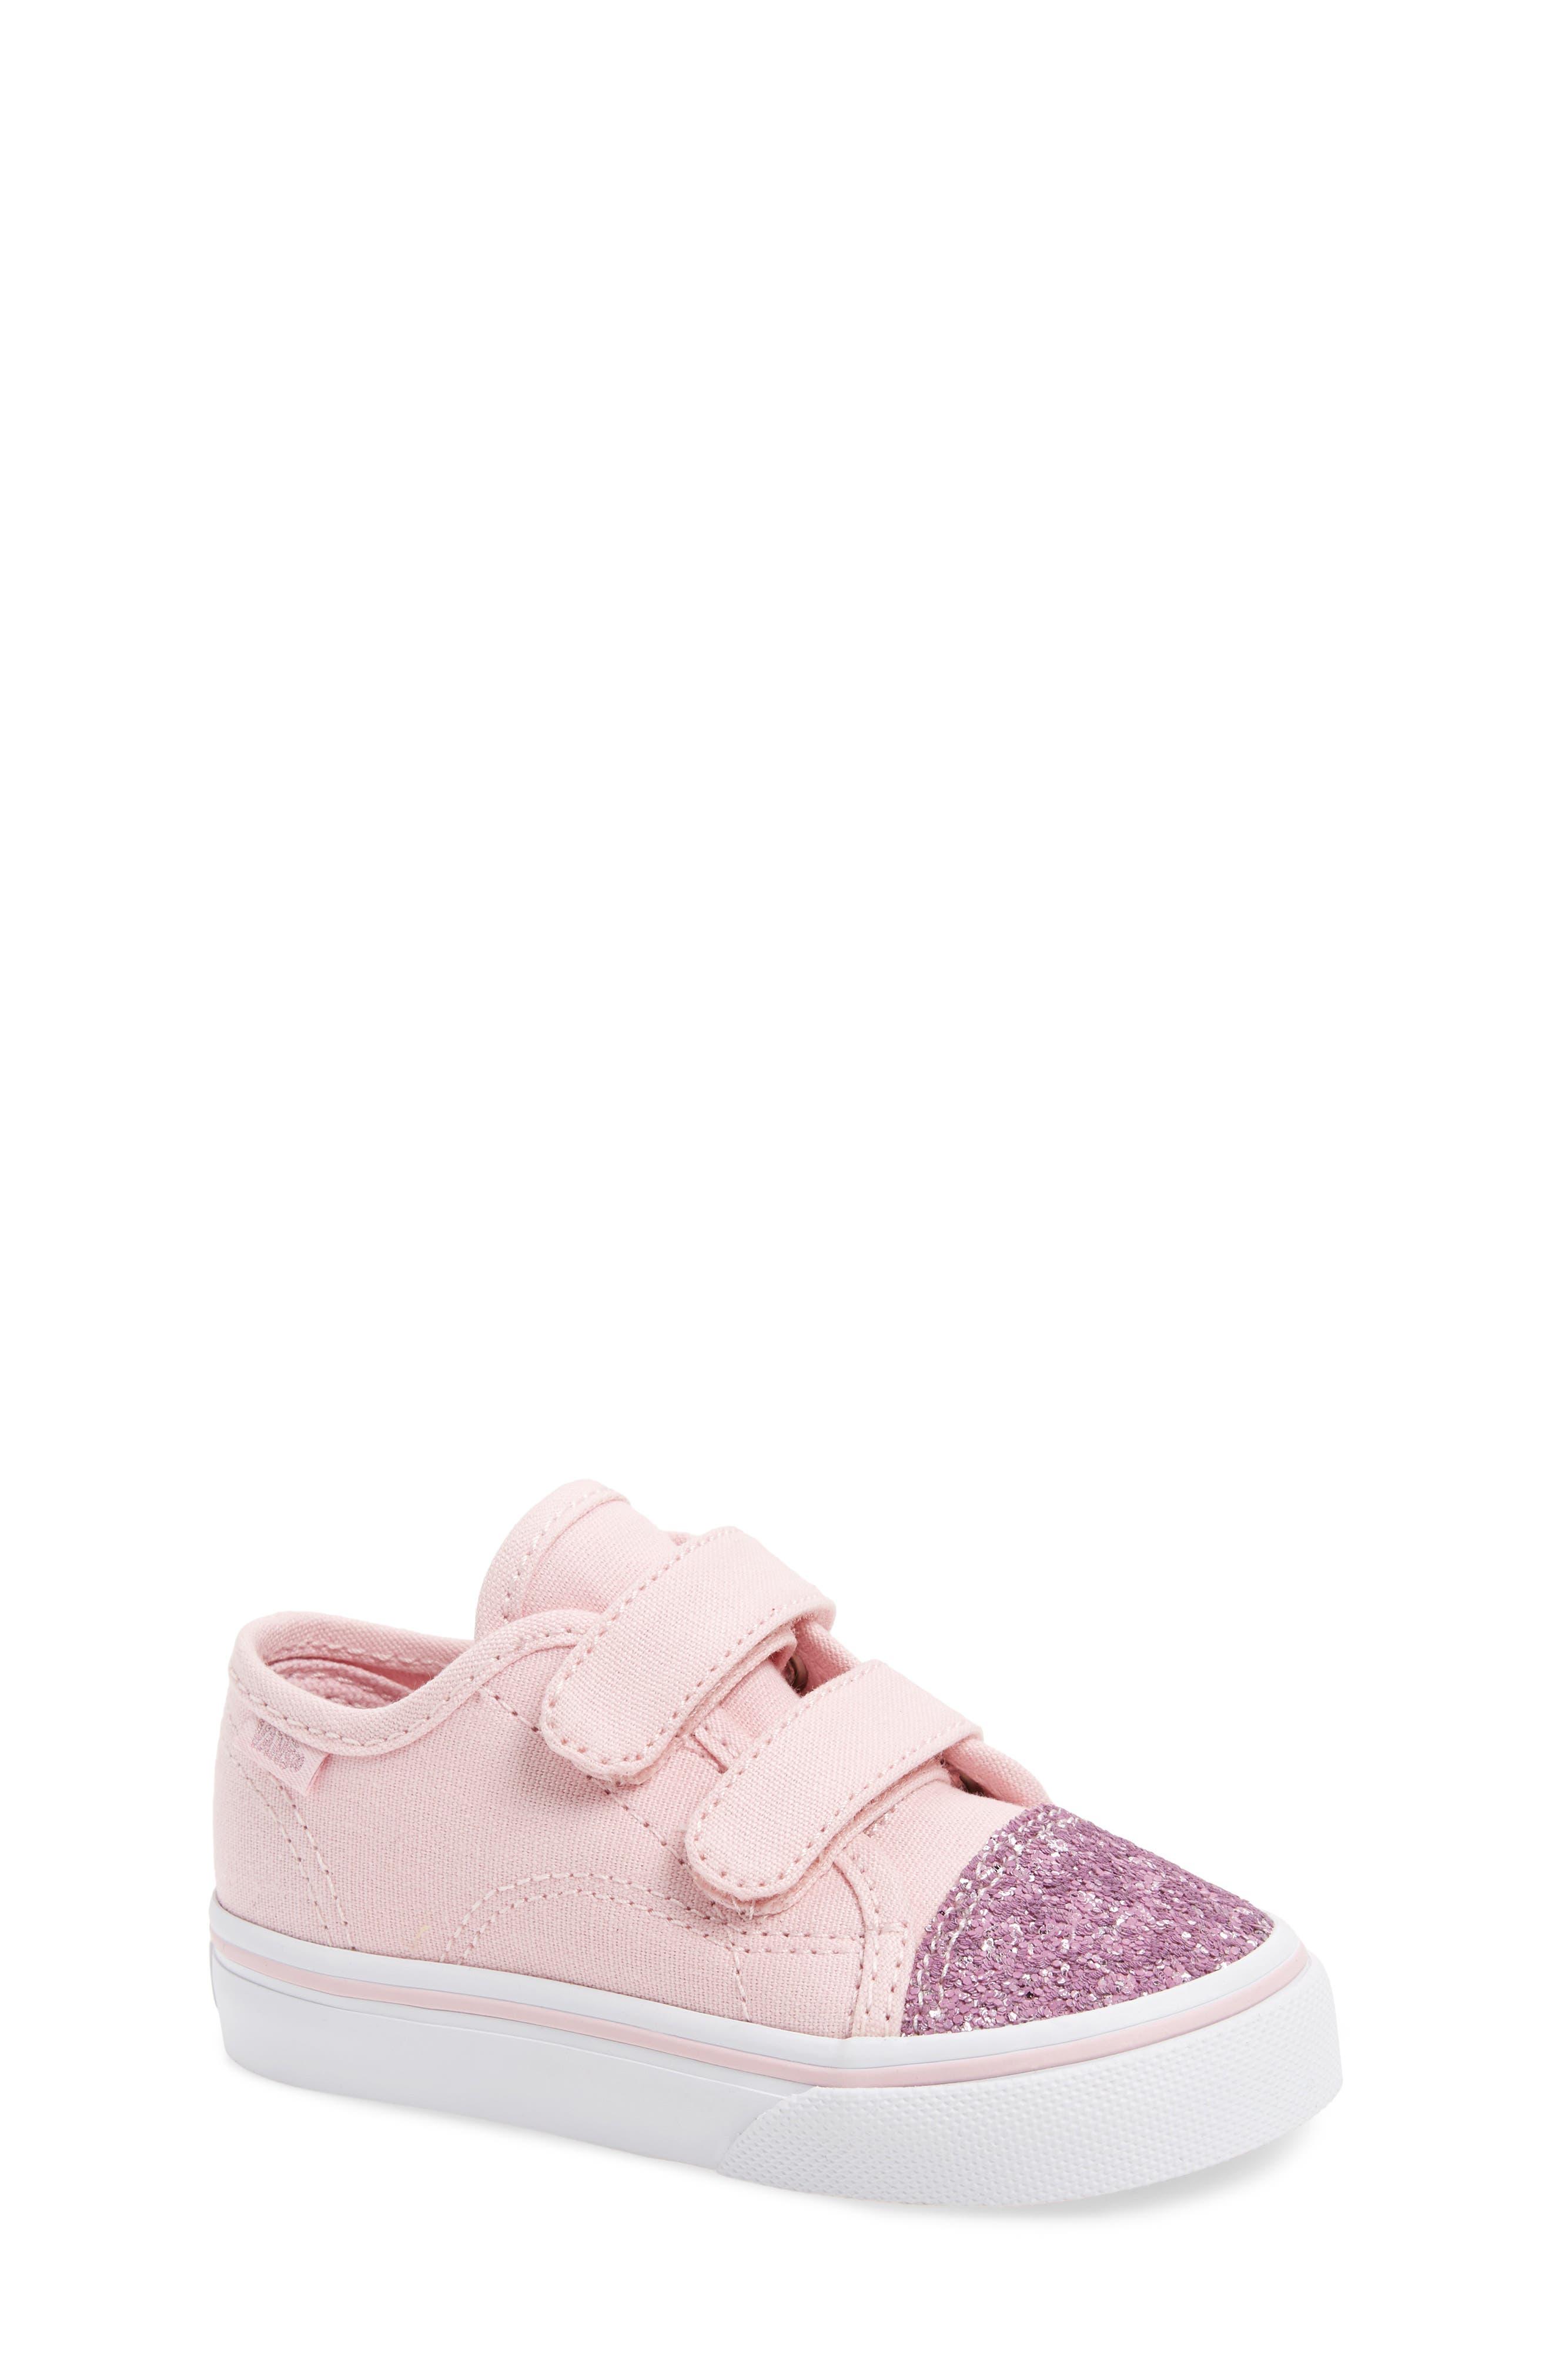 Glitter Toe Style 23 V Sneaker,                             Main thumbnail 1, color,                             Glitter Chalk Pink/ True White